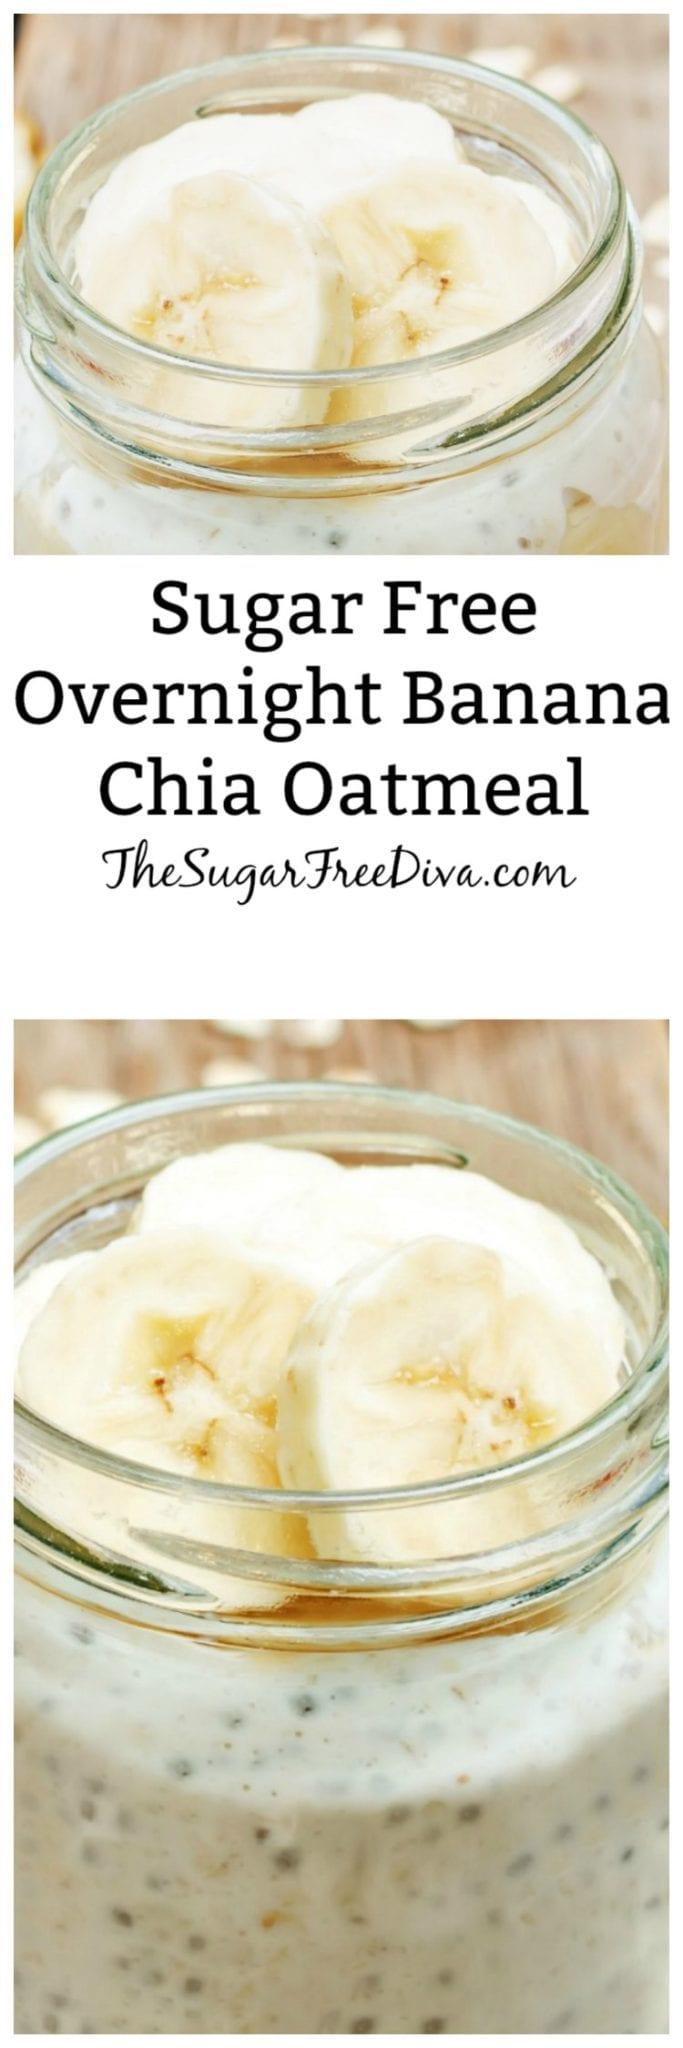 Sugar Free Overnight Banana Chia Oatmeal